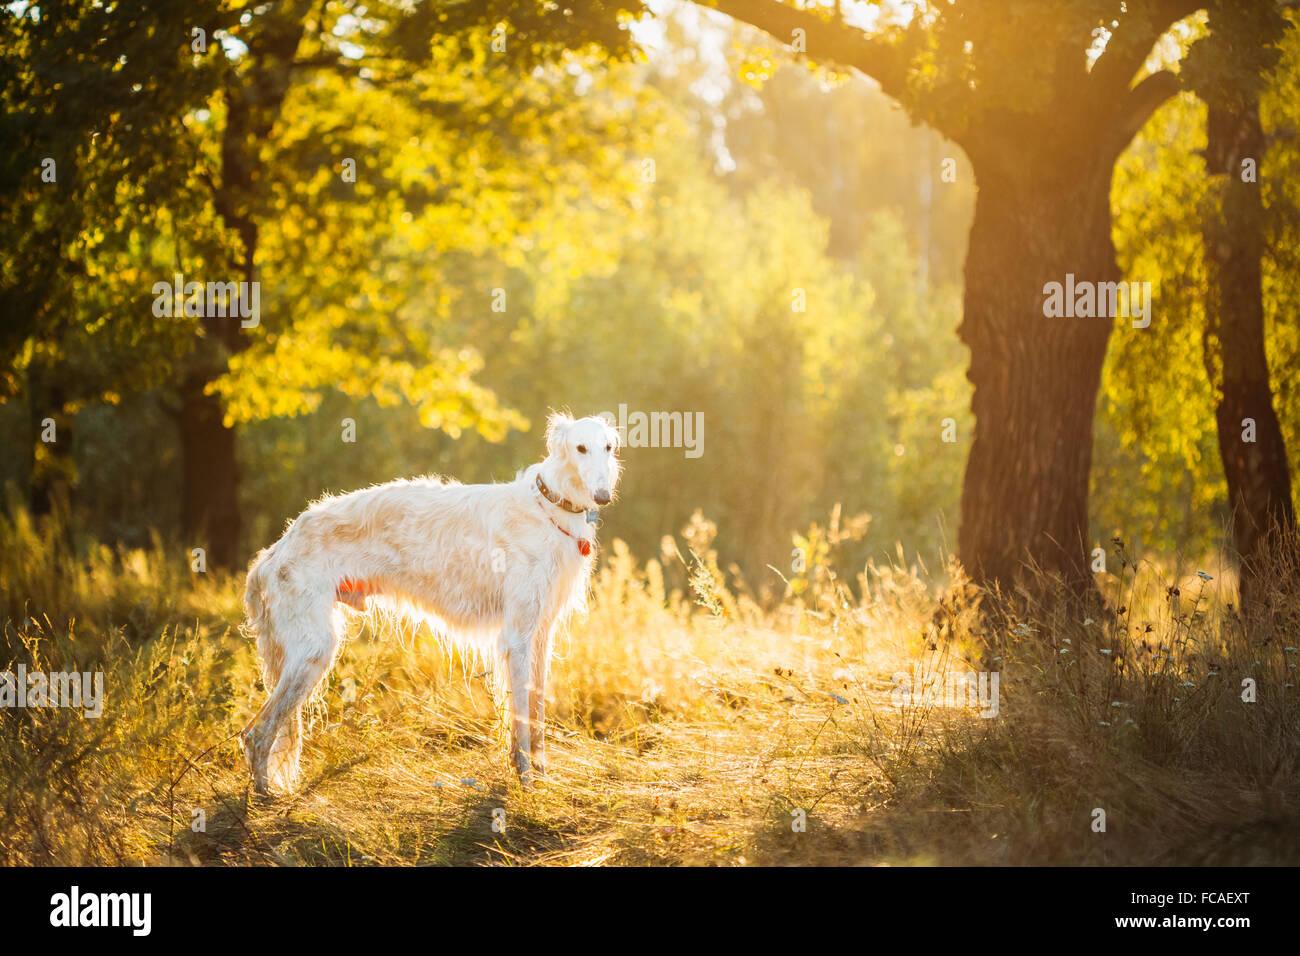 White Russian Dog, Borzoi, Hunting dog in Summer Sunset Sunrise Forest. - Stock Image